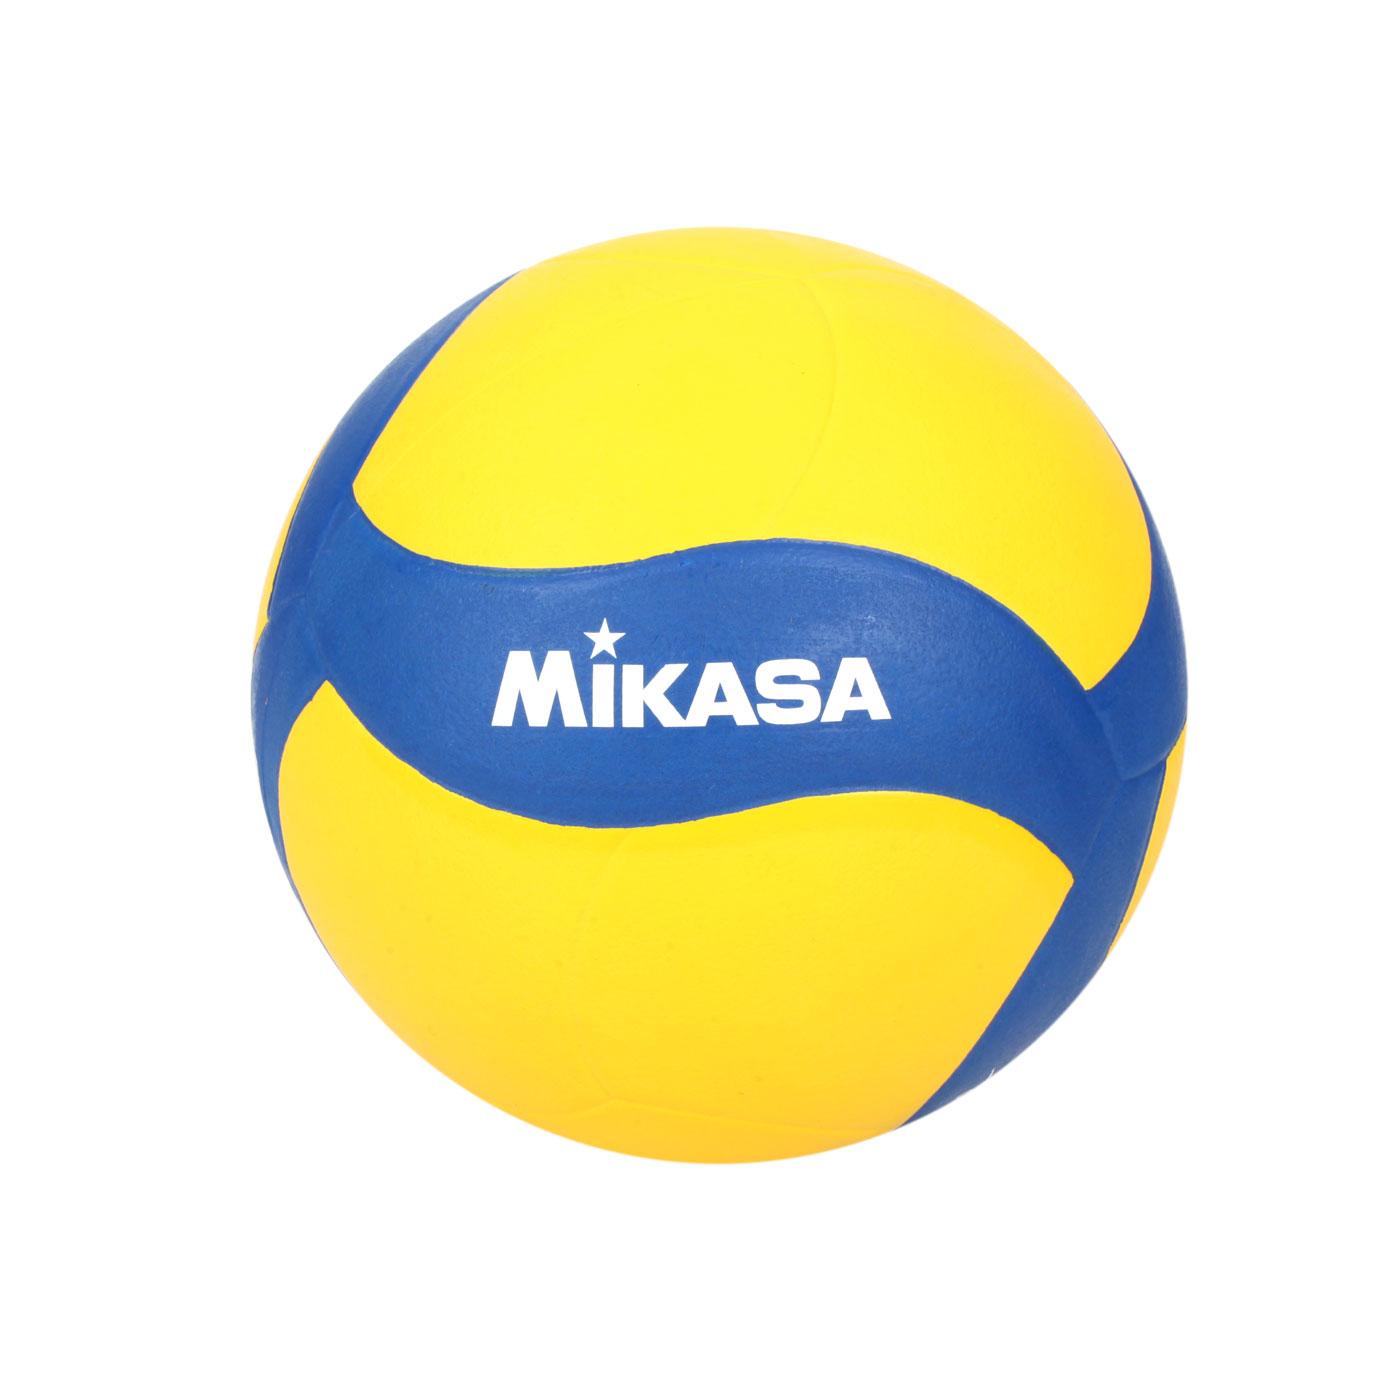 MIKASA 螺旋型軟橡膠排球#4 V024WS